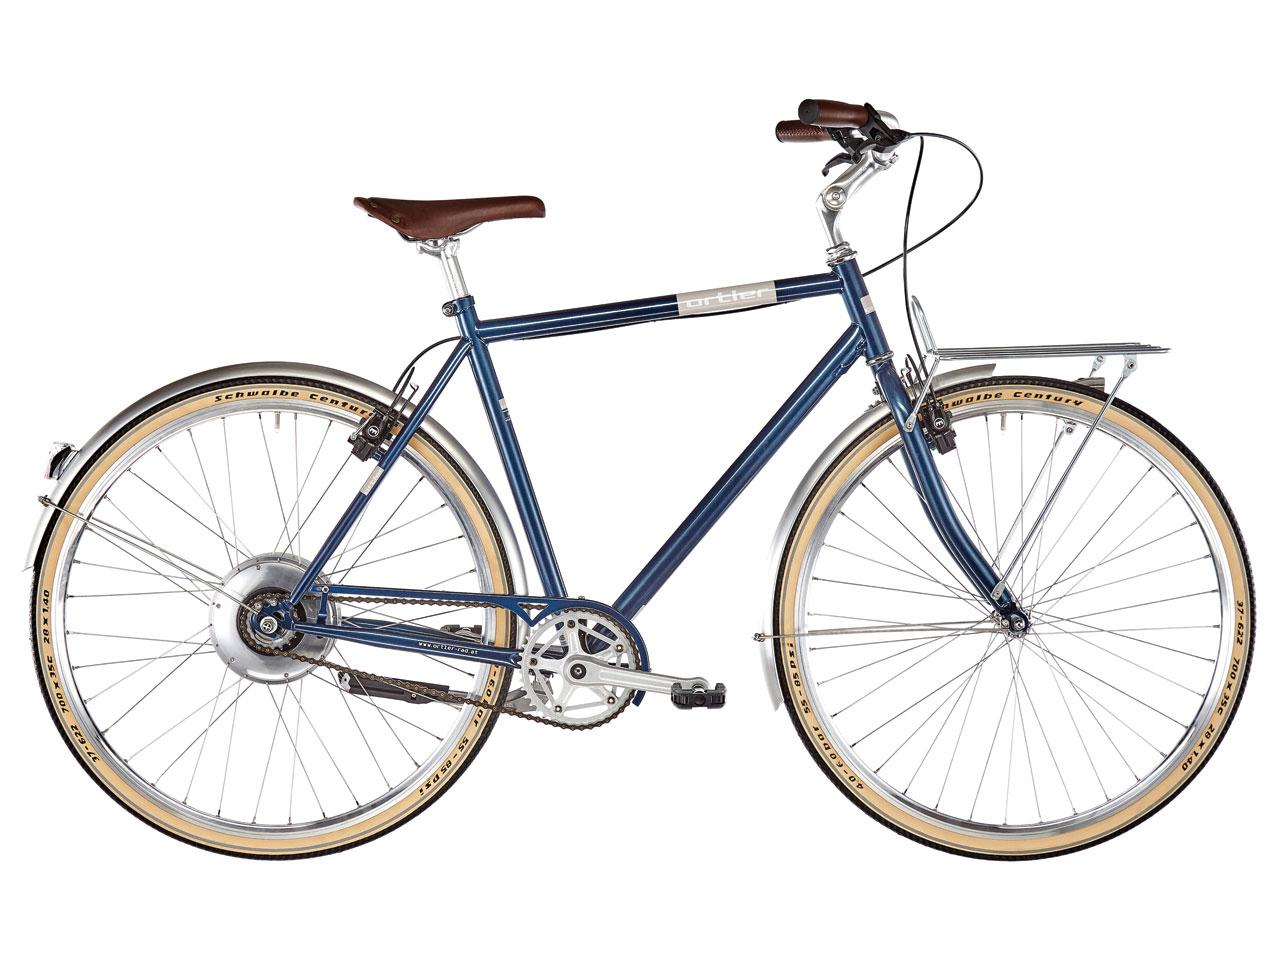 ORTLER Bricktown Zehus classic blue